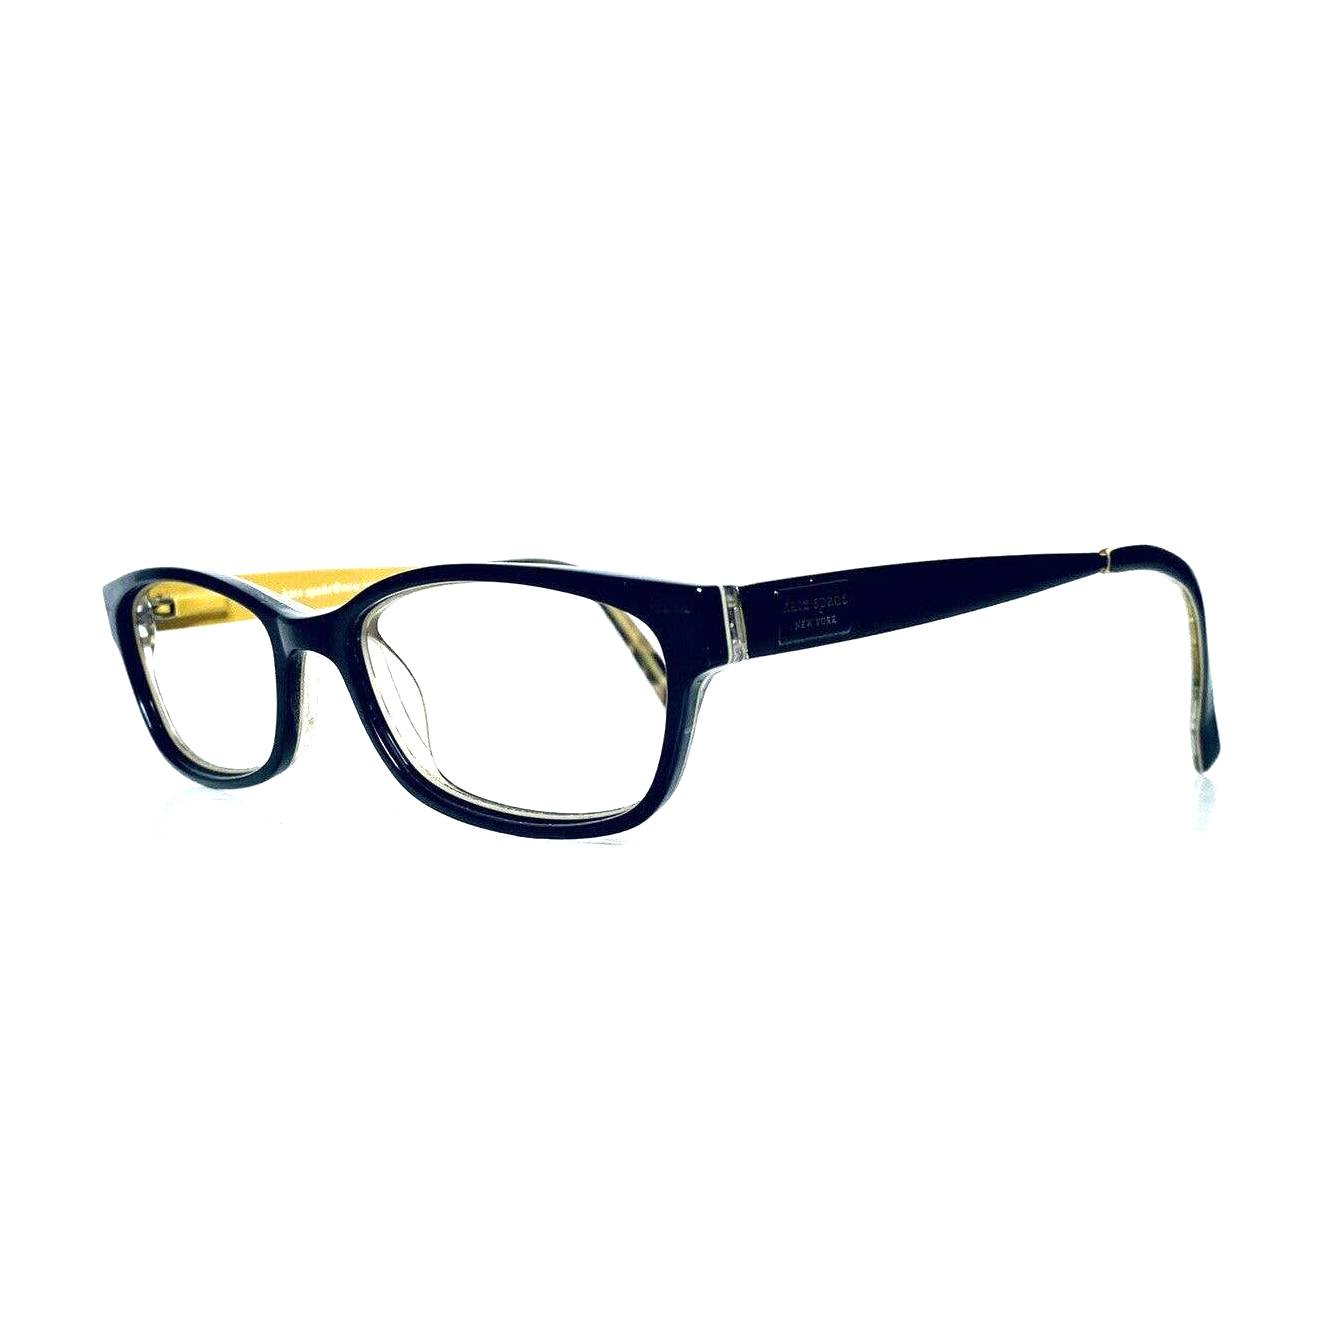 Kate Spade NY Black Wayfarer Glasses